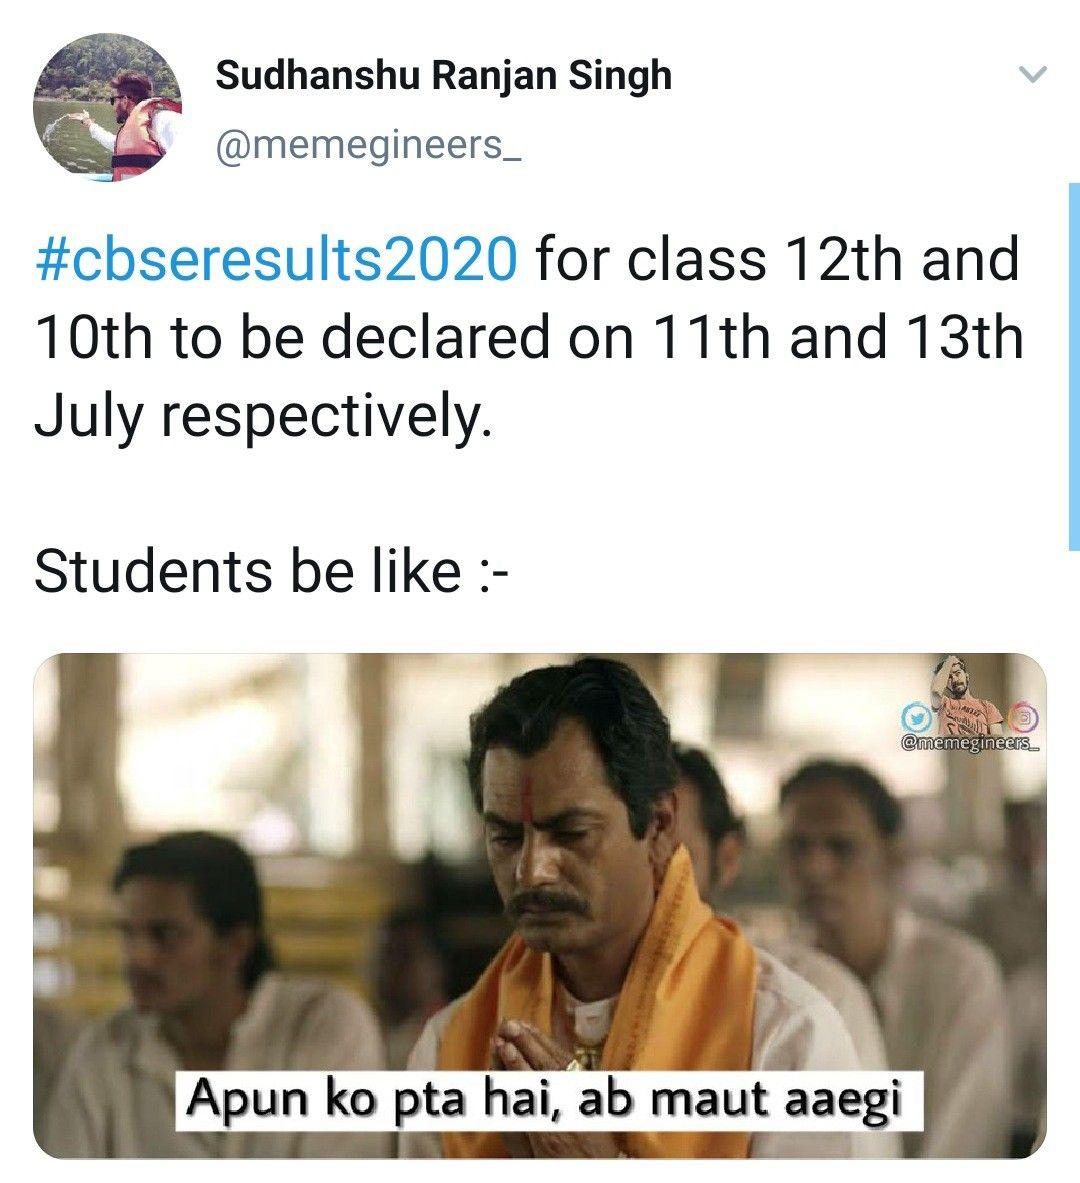 School Meme Cbse Result Meme Class 12th Funny Memes Funny Indian Memes Hindi Memes Funny Memes Memes School Memes